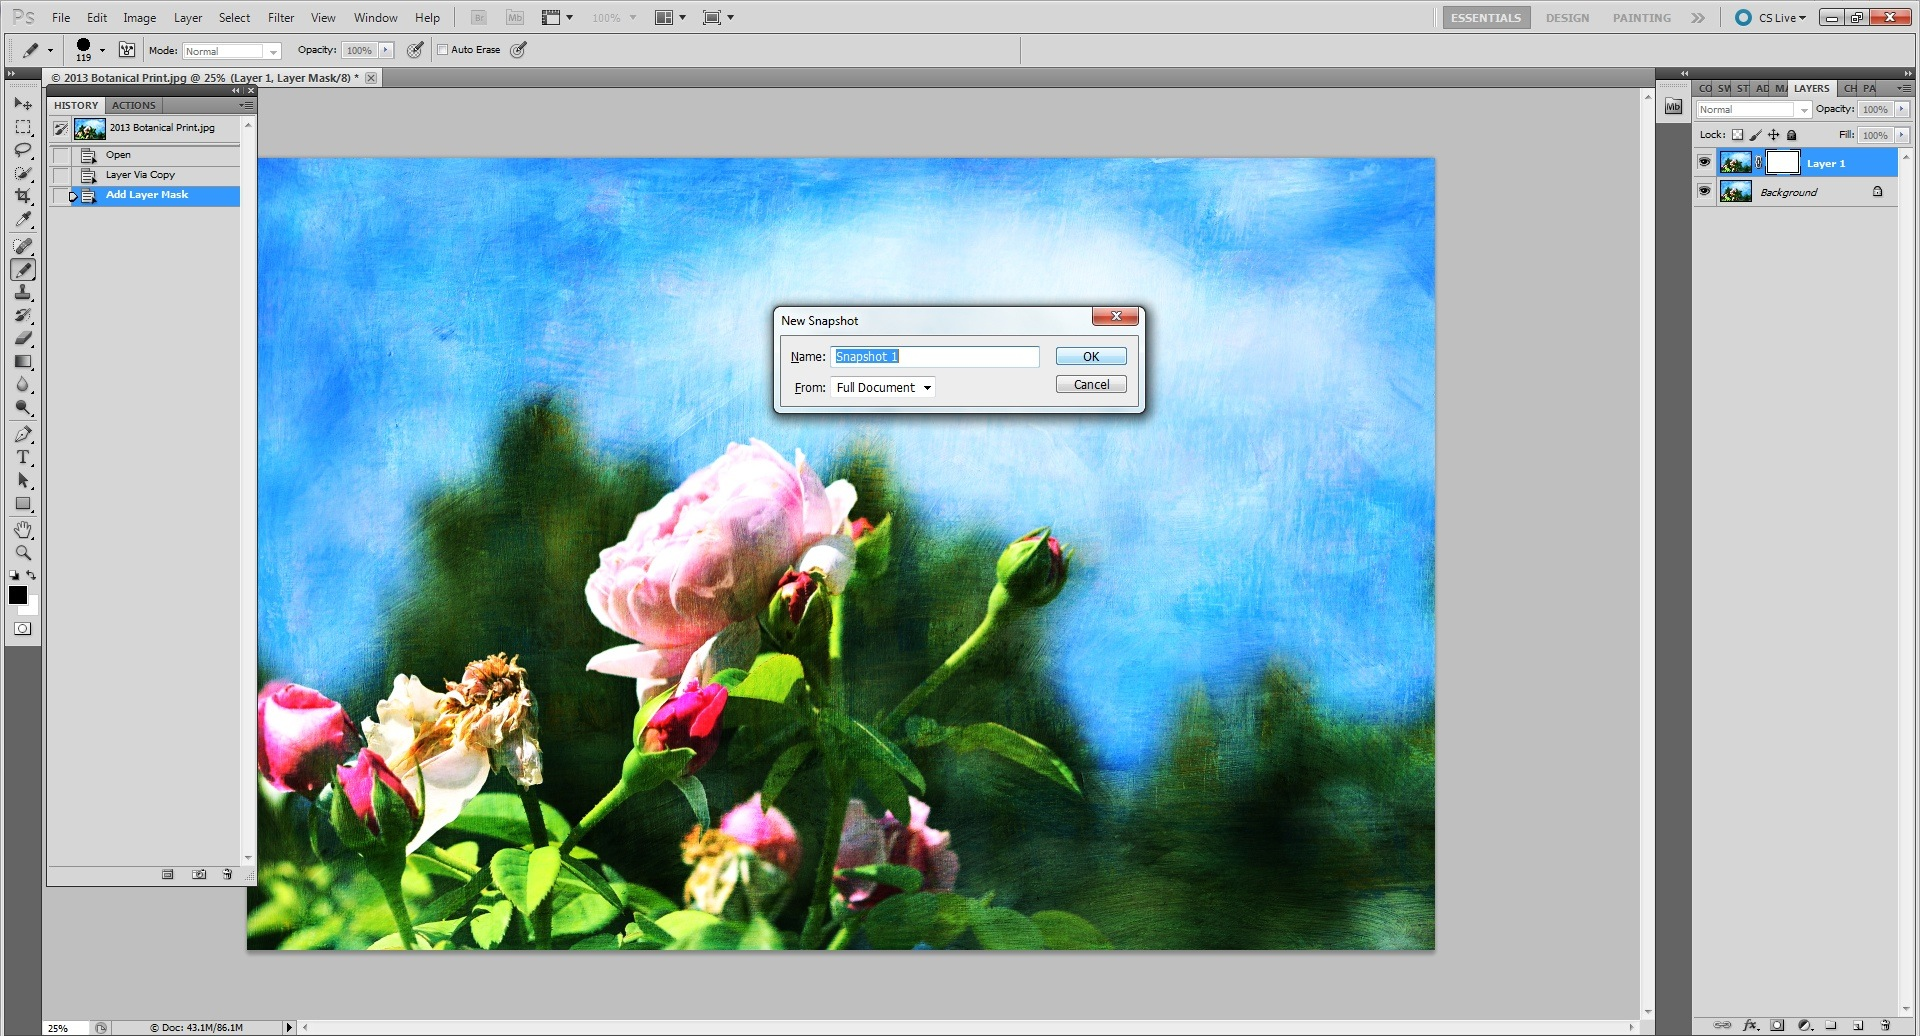 alt-and-new-snapshot.jpg